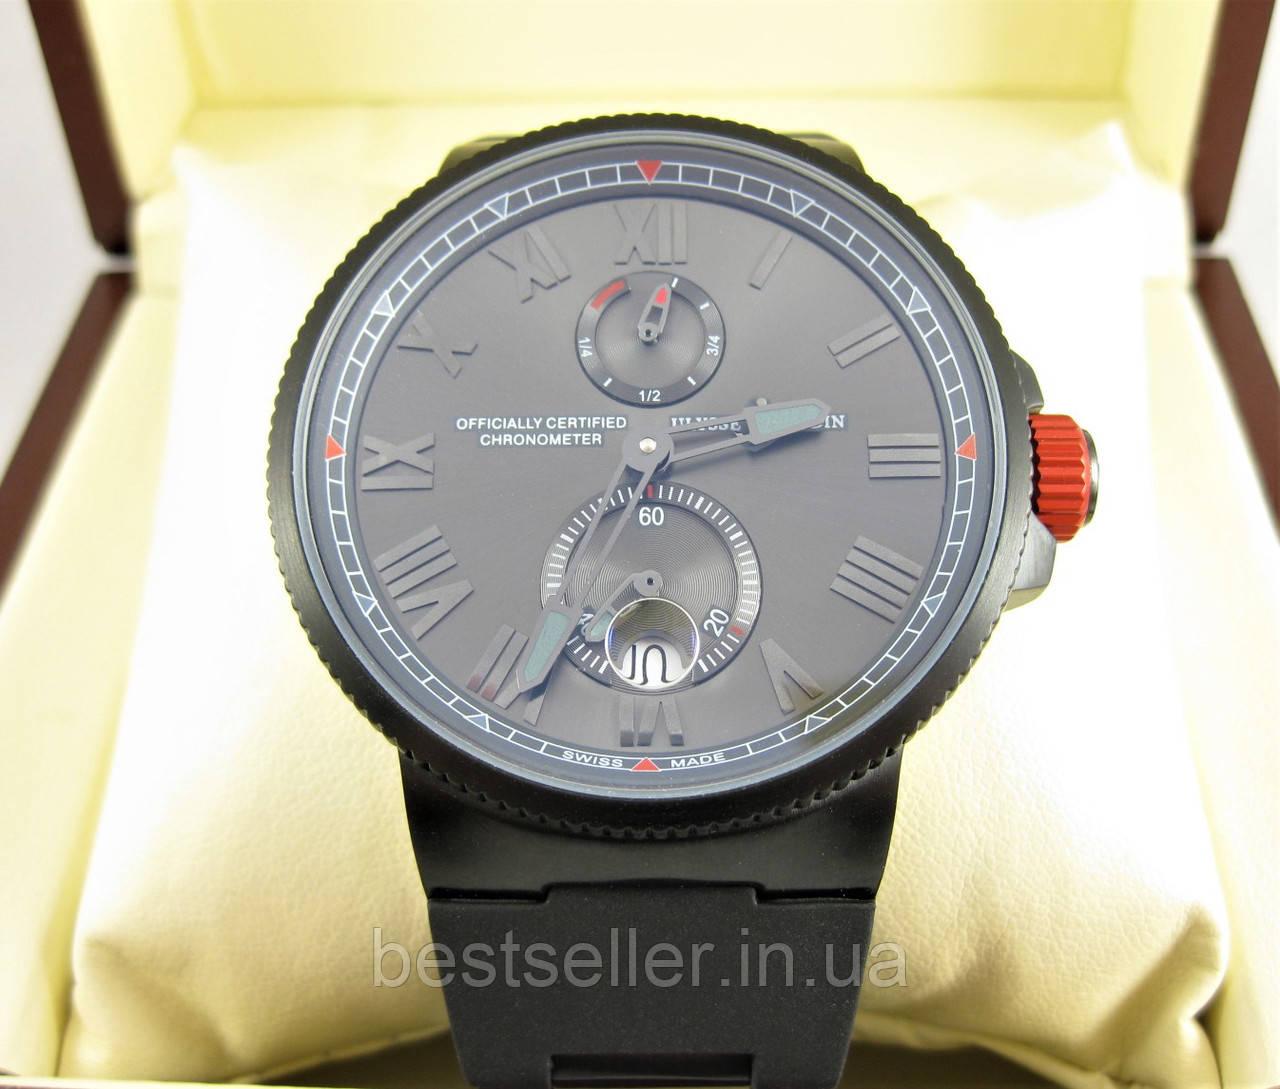 Часы Ulysse Nardin Choronometer 45mm (механика) Black Edition. Класс ... 394bb83256f